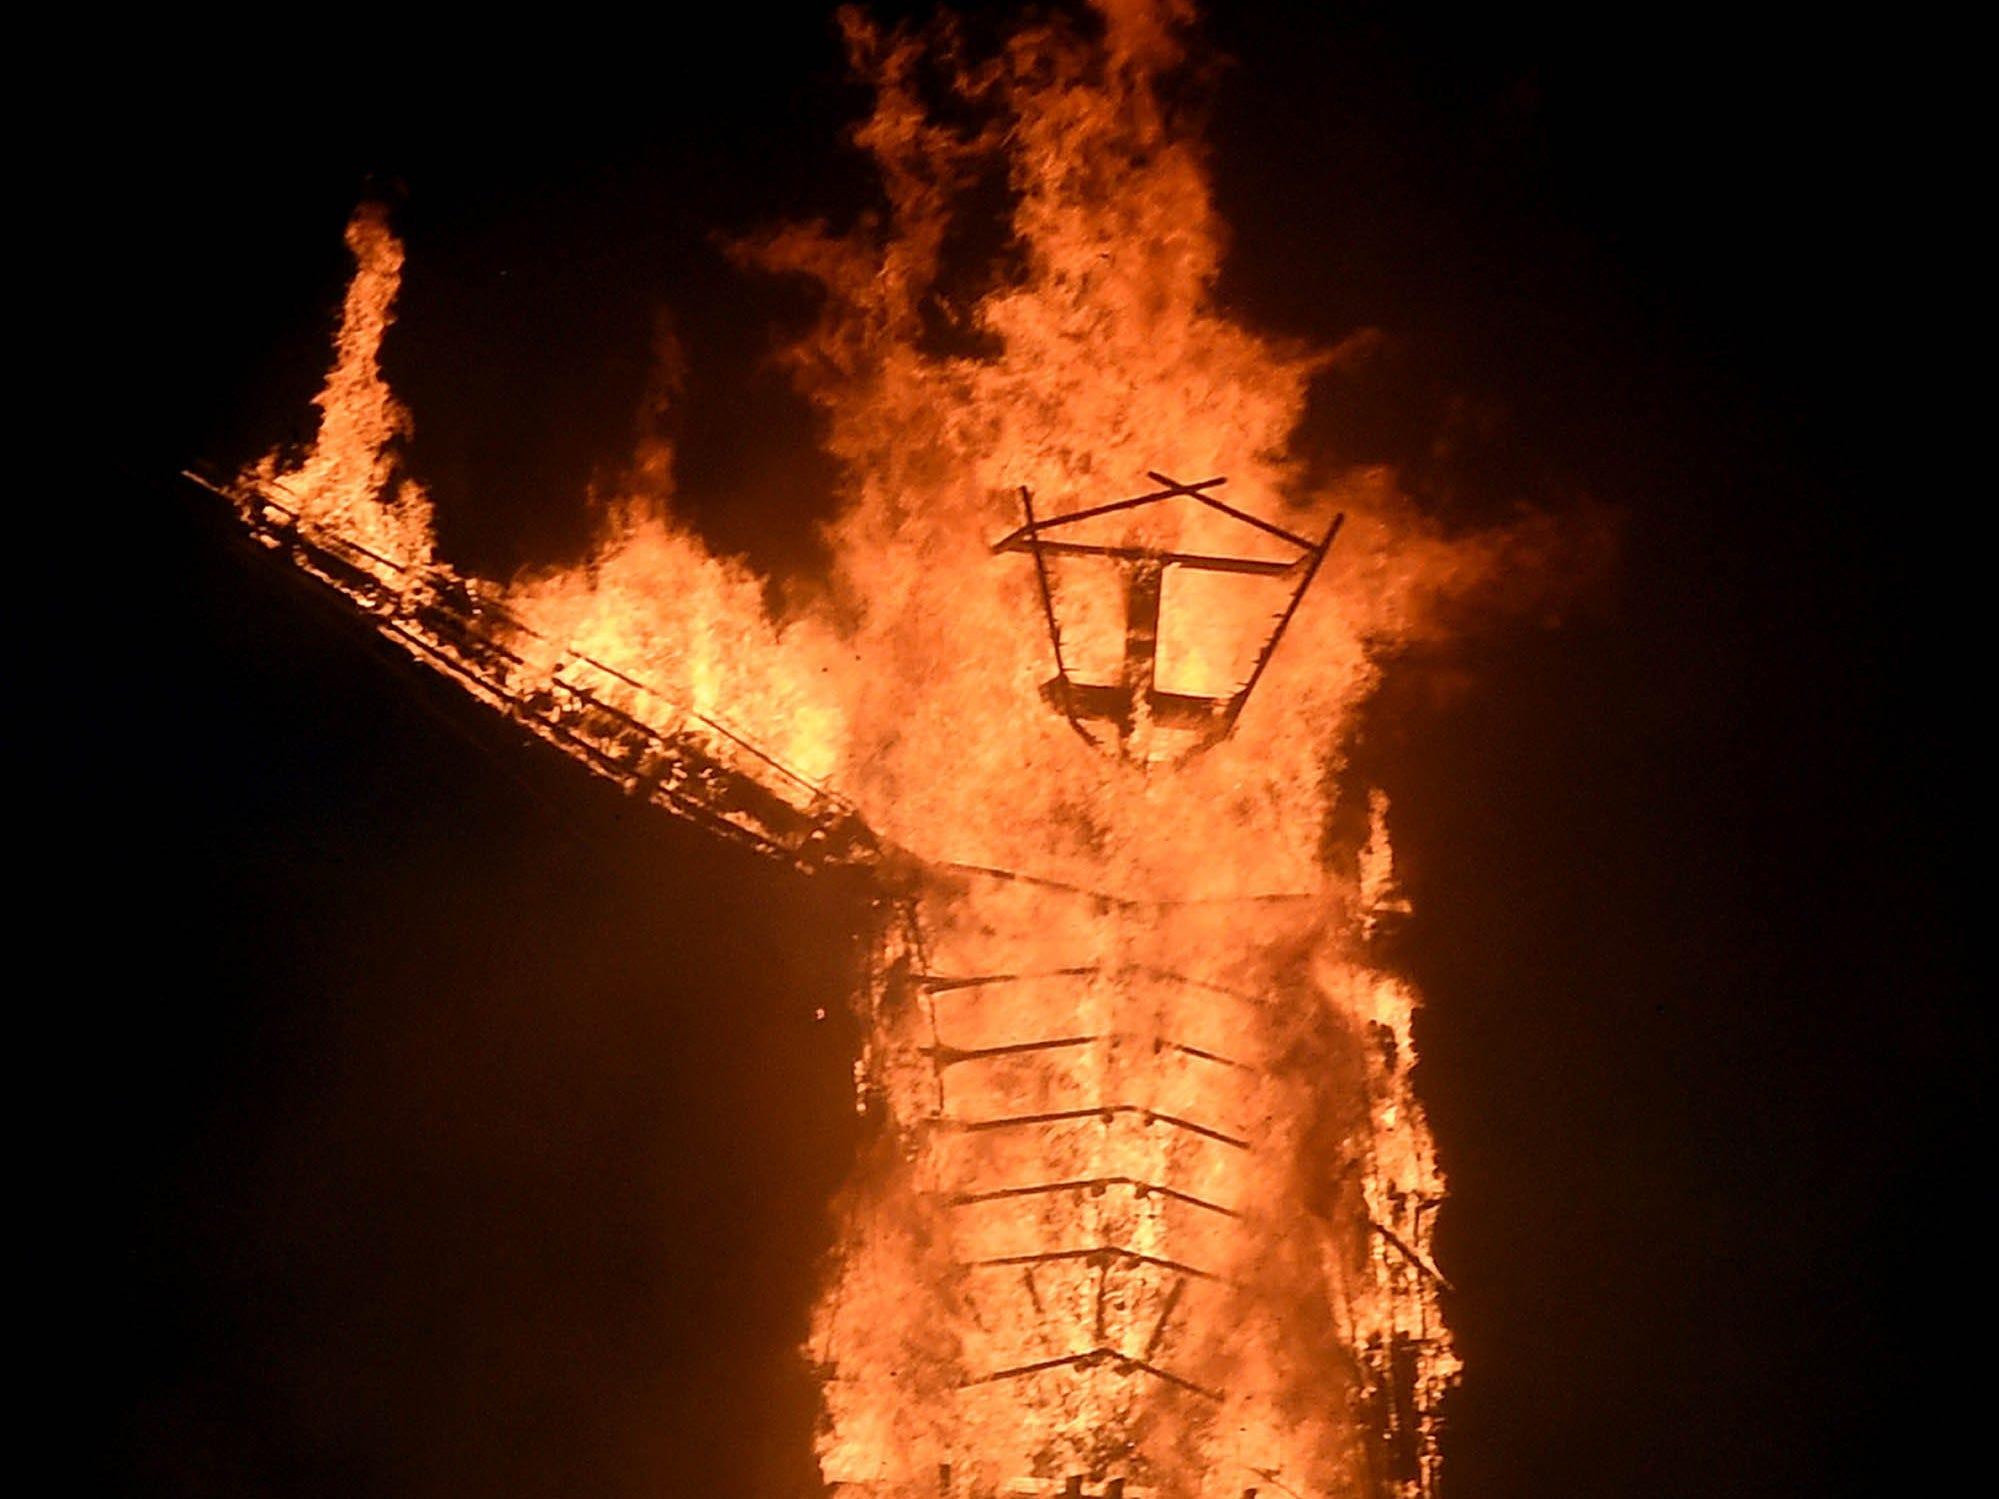 The Man effigy burns at Burning Man.